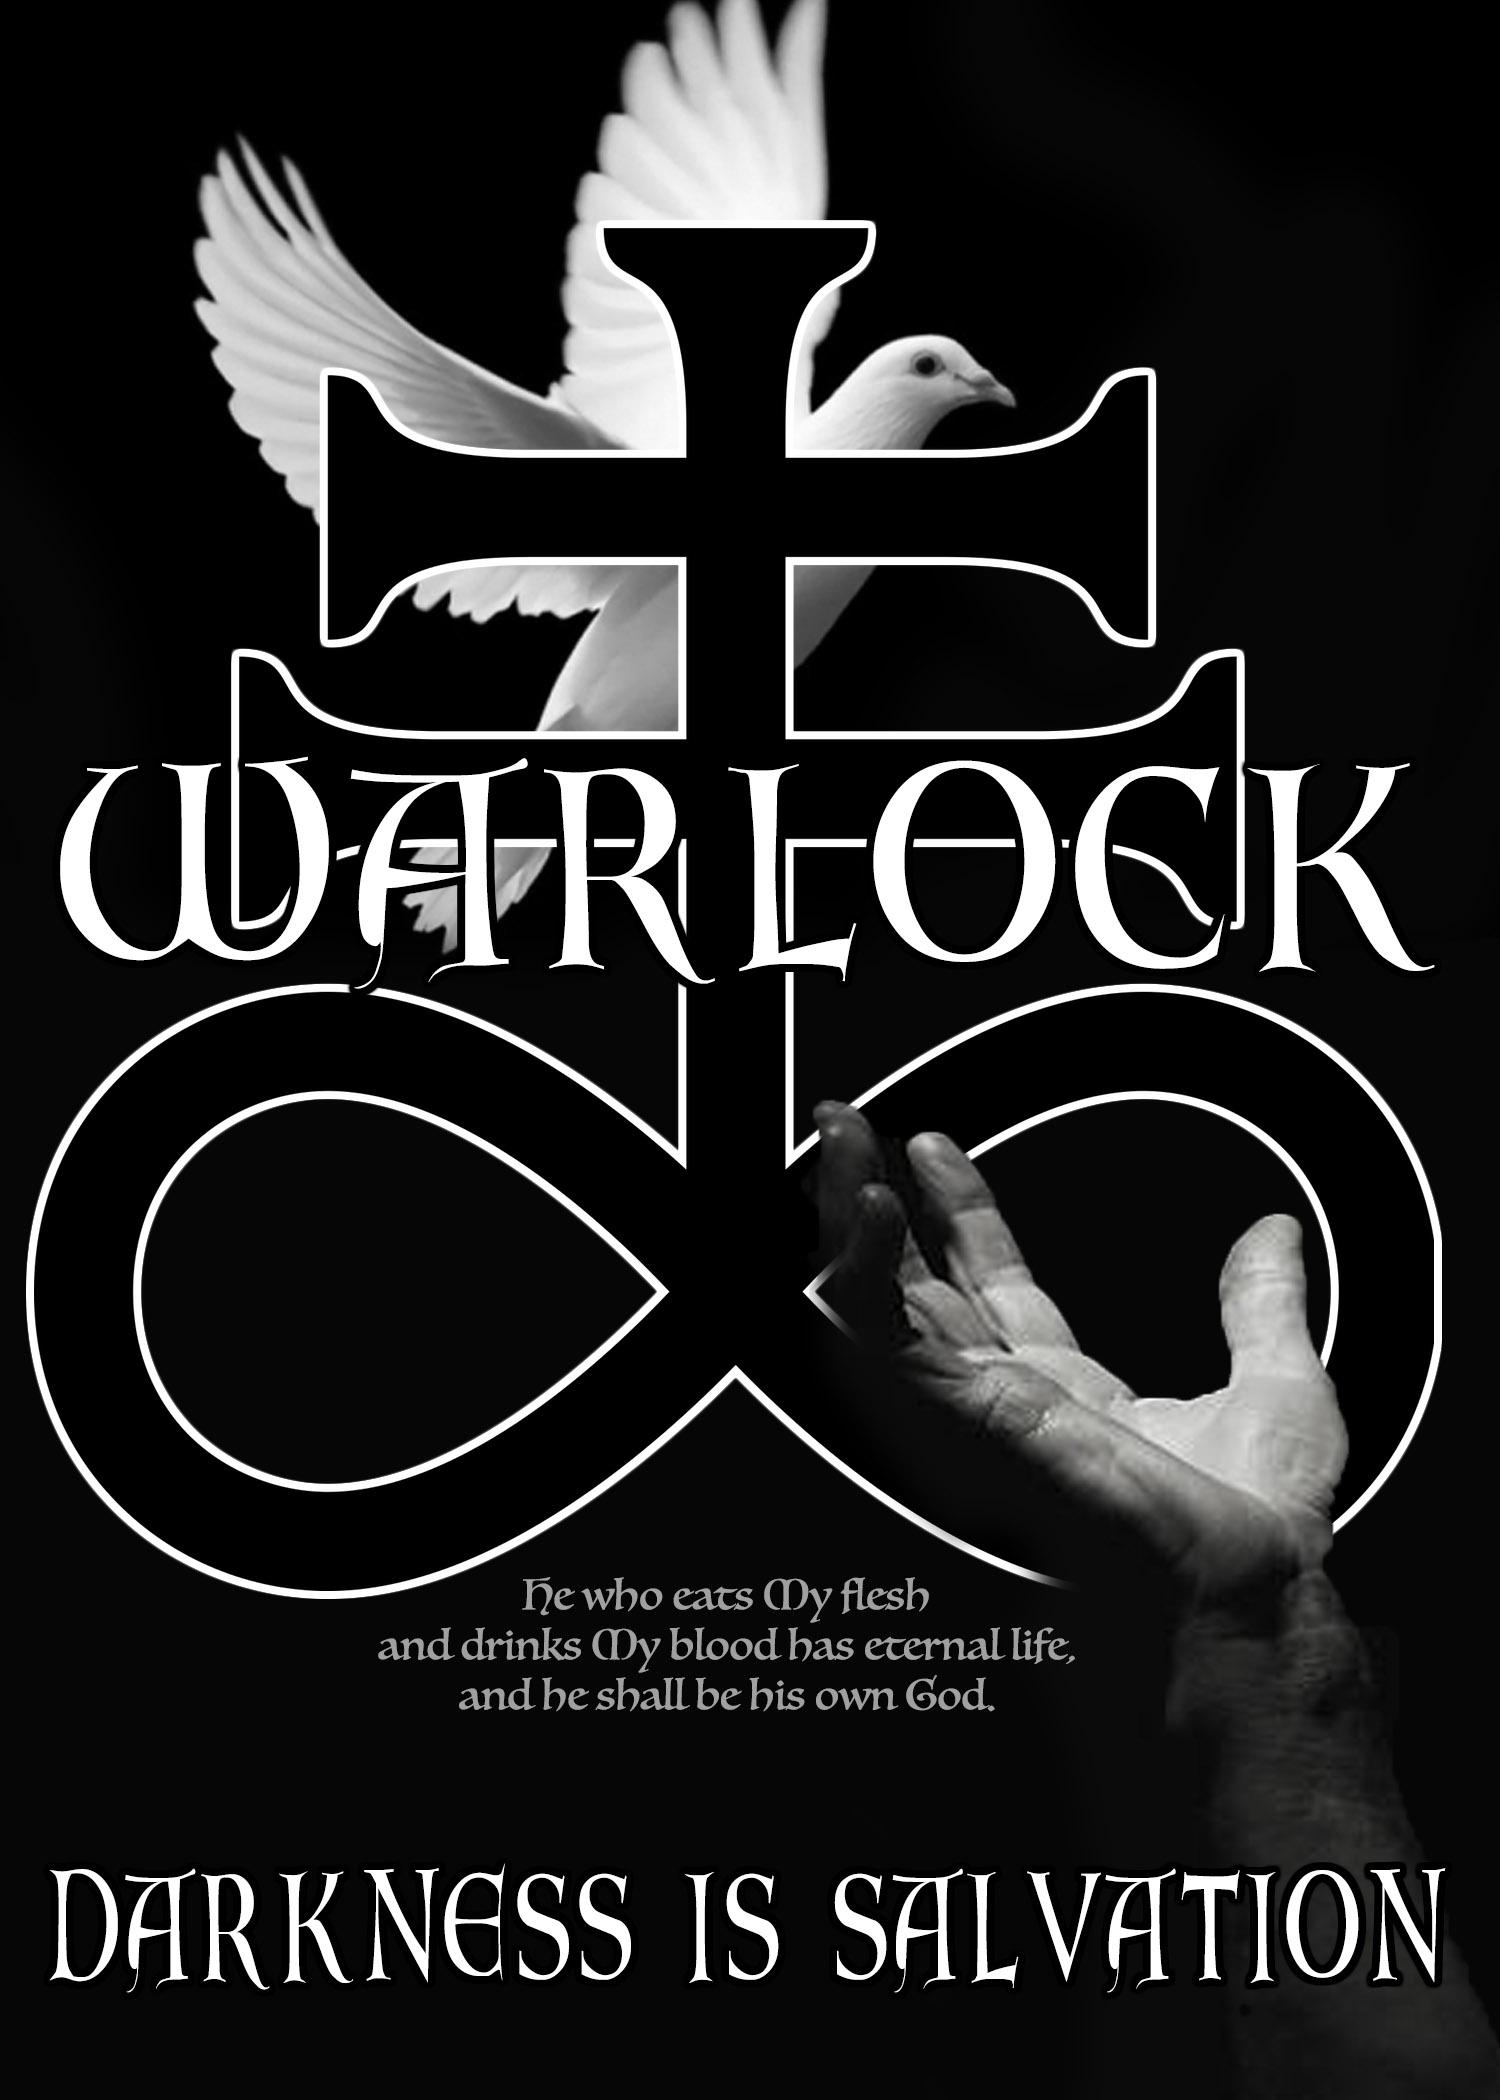 warlock 2.jpg